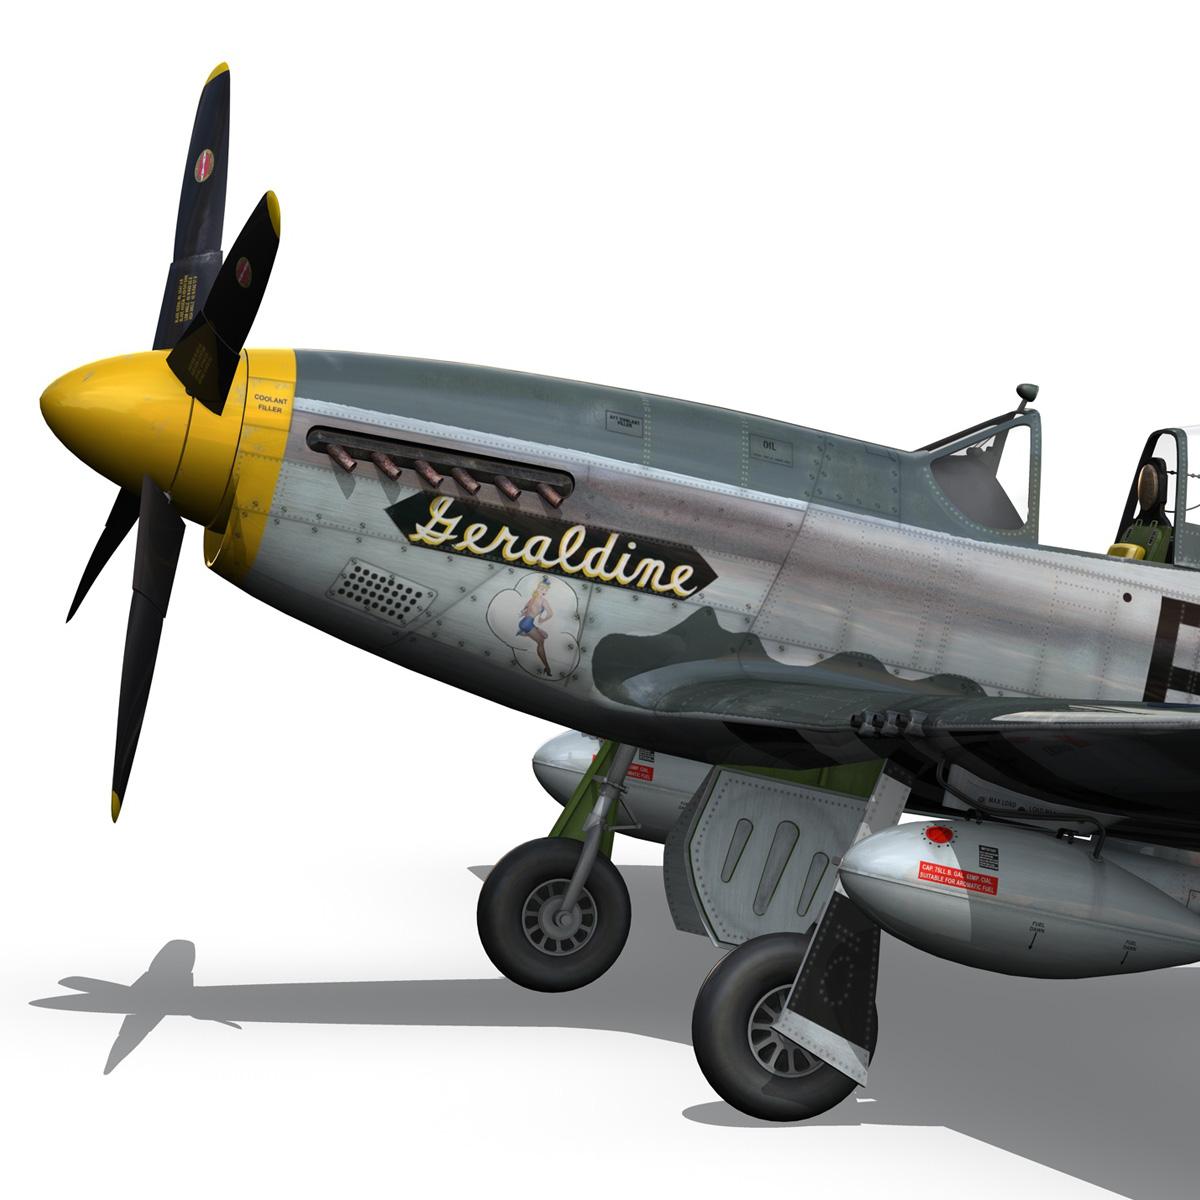 North American P-51D - Geraldine 3d model fbx c4d lwo obj 265945